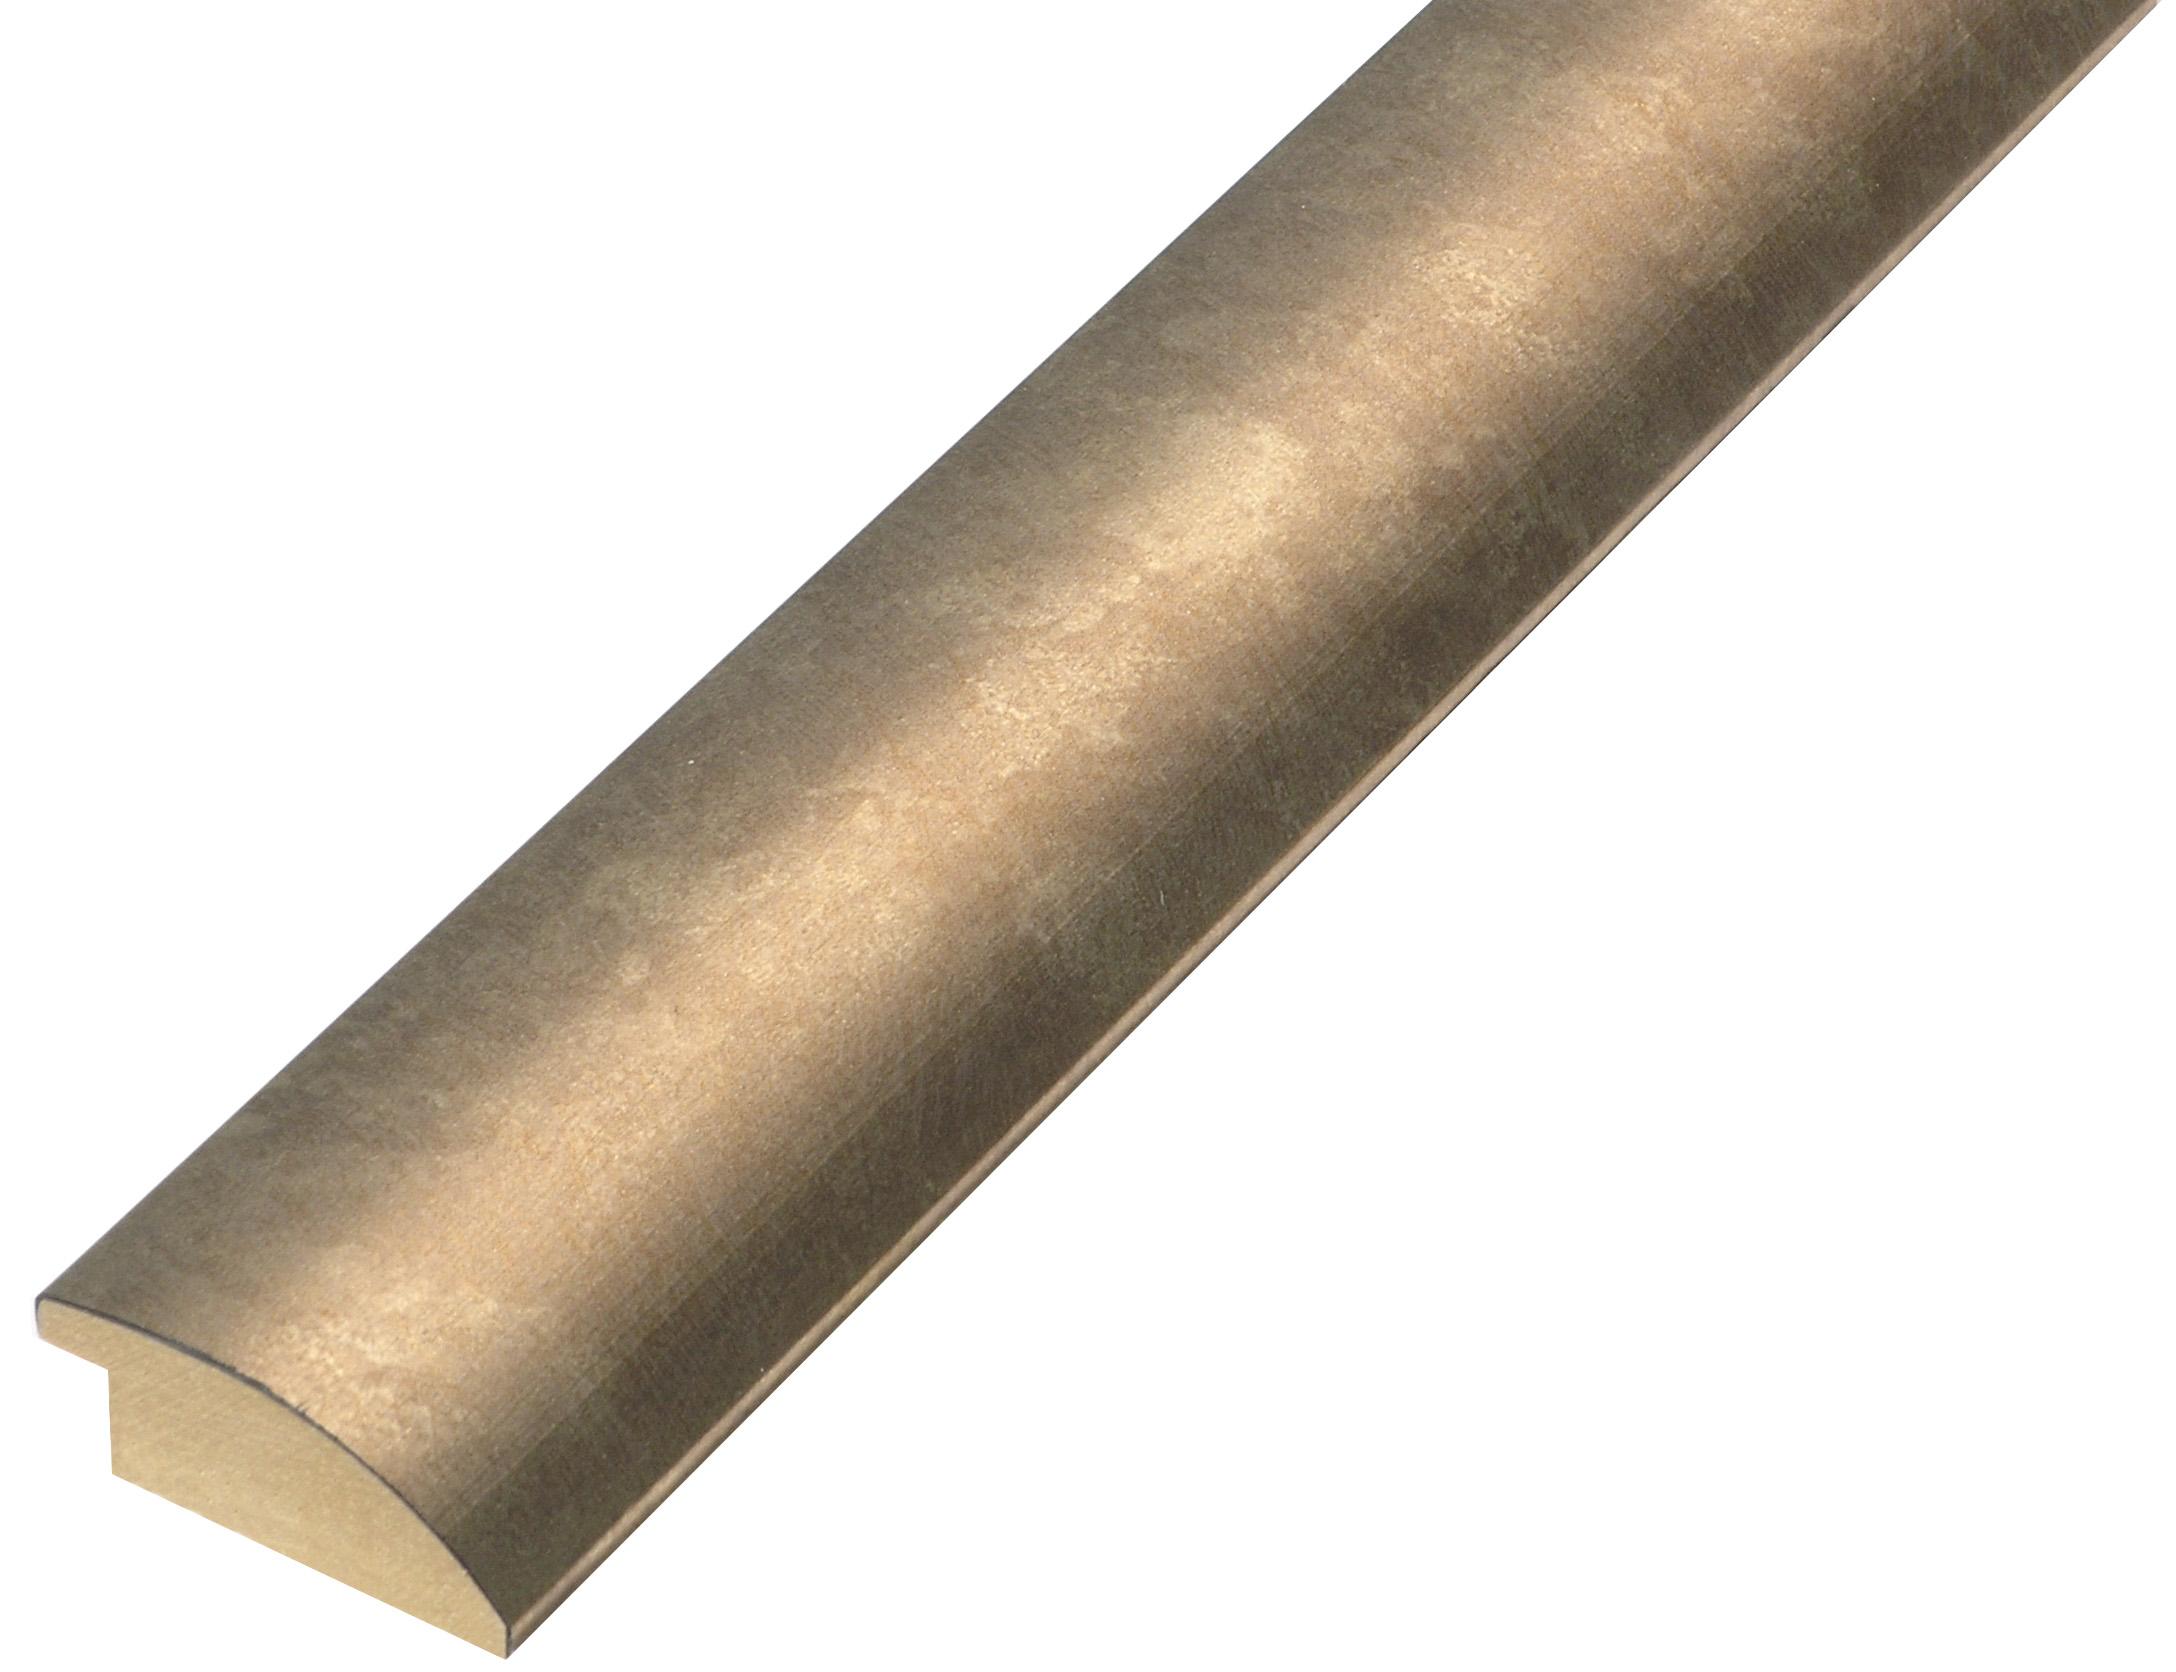 Moulding ayous, width 35mm - bronze finish